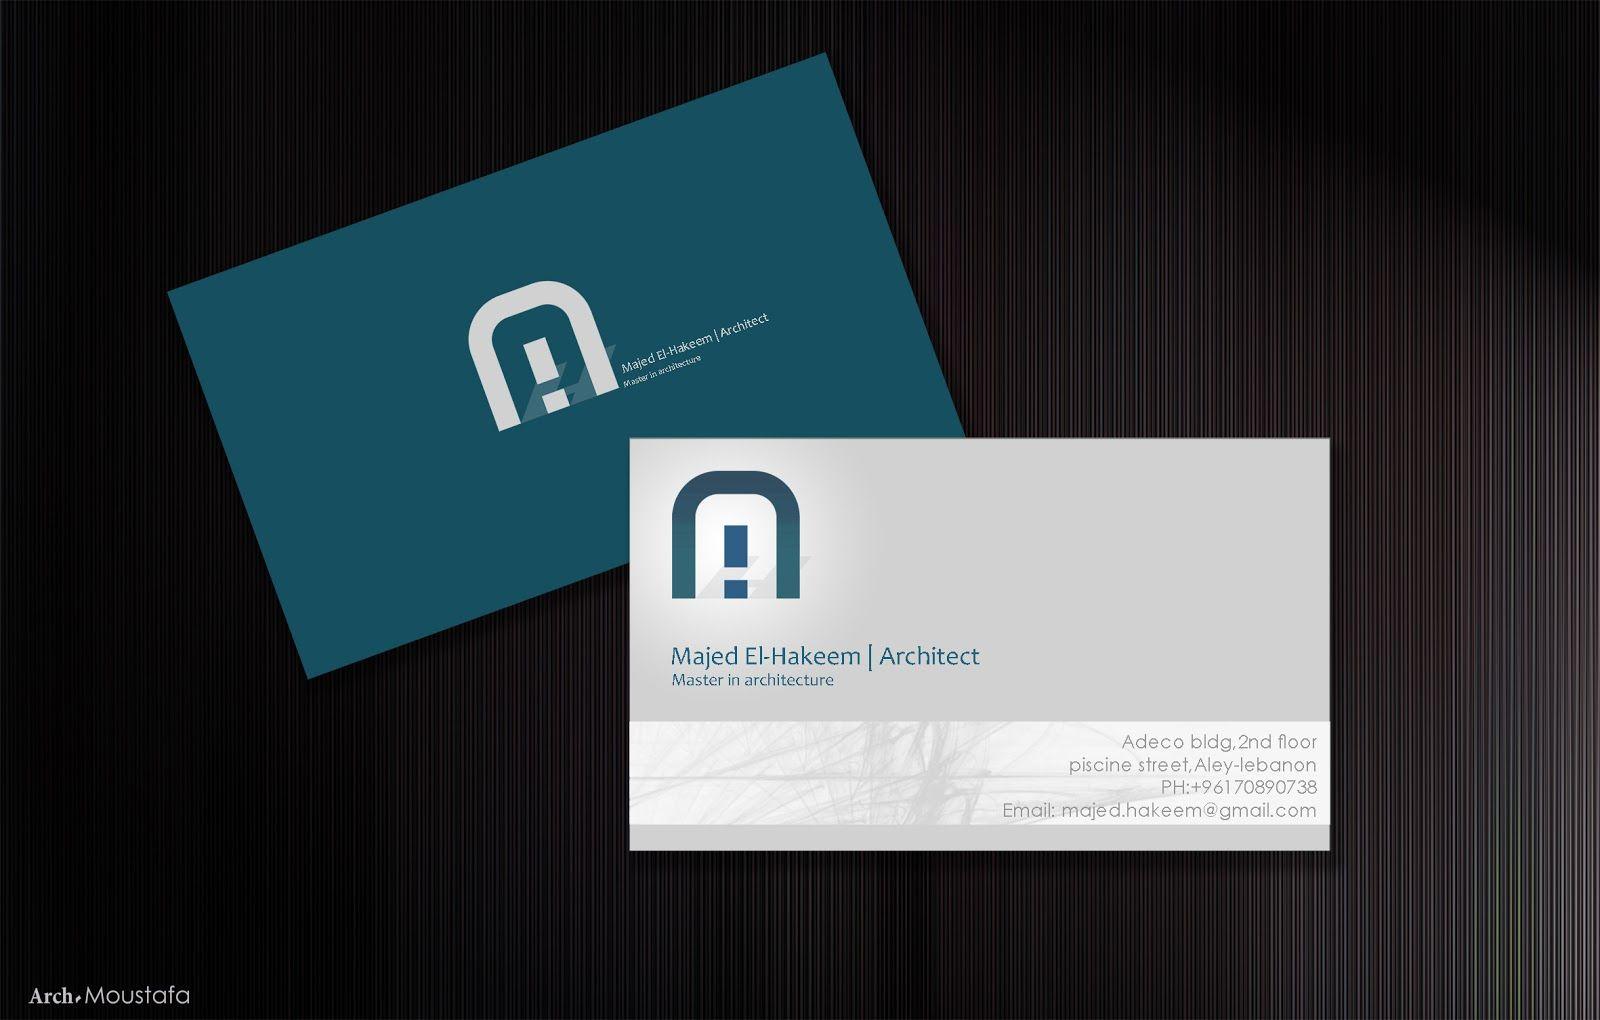 Architect Majed El-hakeem business card & logo |by Blu phi graphics ~ Blu Phi Architects